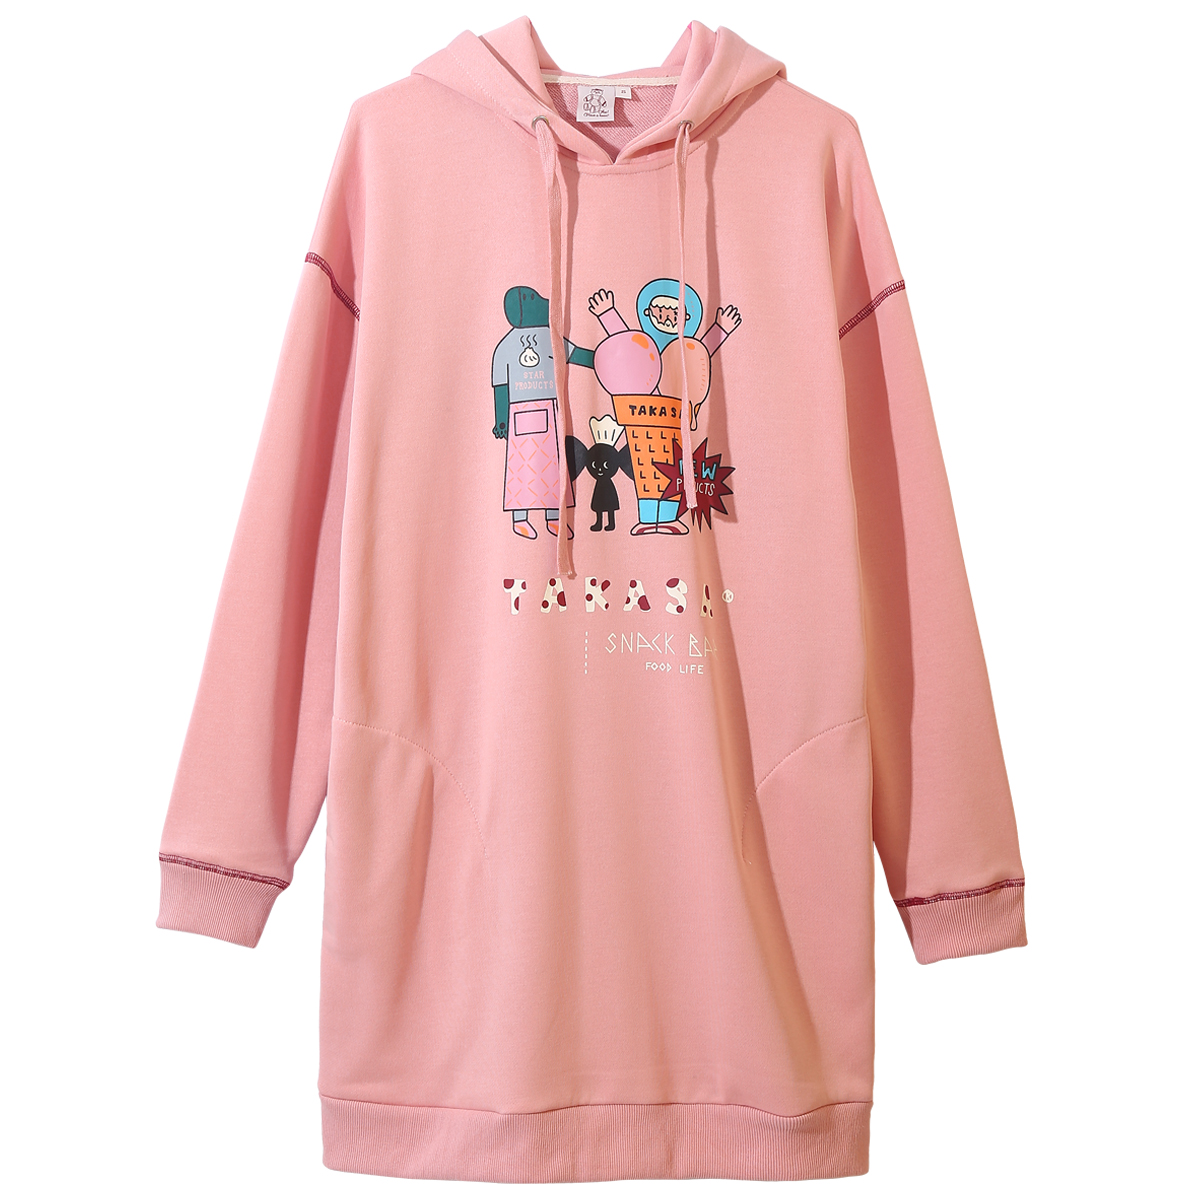 High Quality Fashion Design Autumn Spring Women Long Sweatshirt Big Hoodies Pullovers Sweatshirts Dress Jumper Top